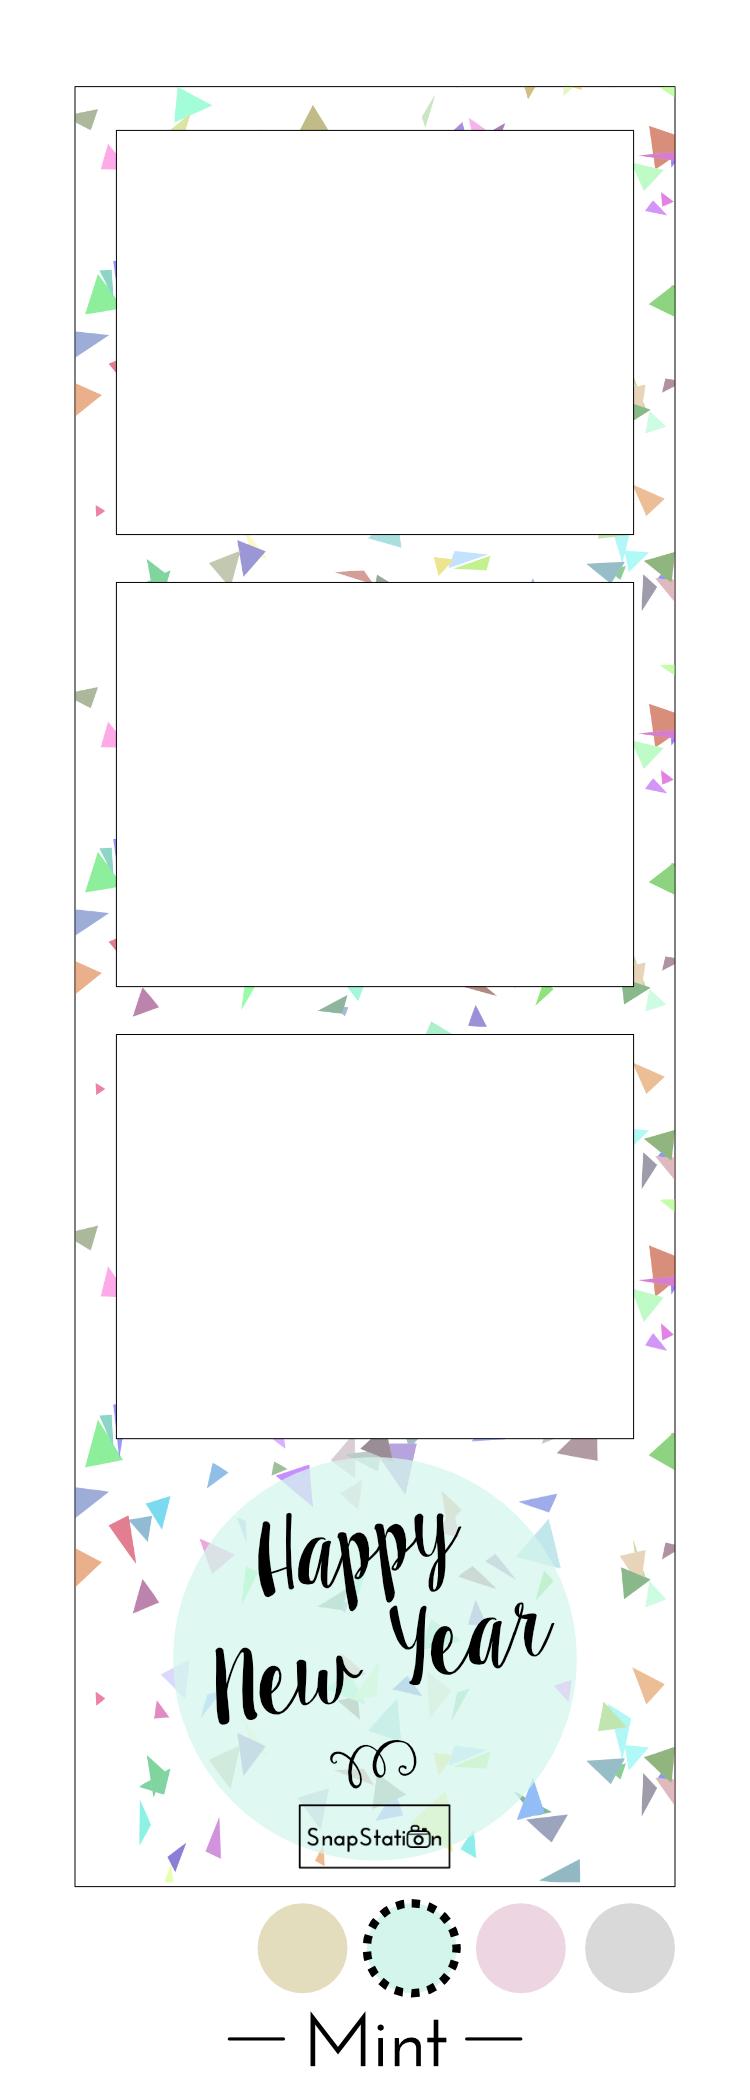 Photo strip confetti - Mint.jpg